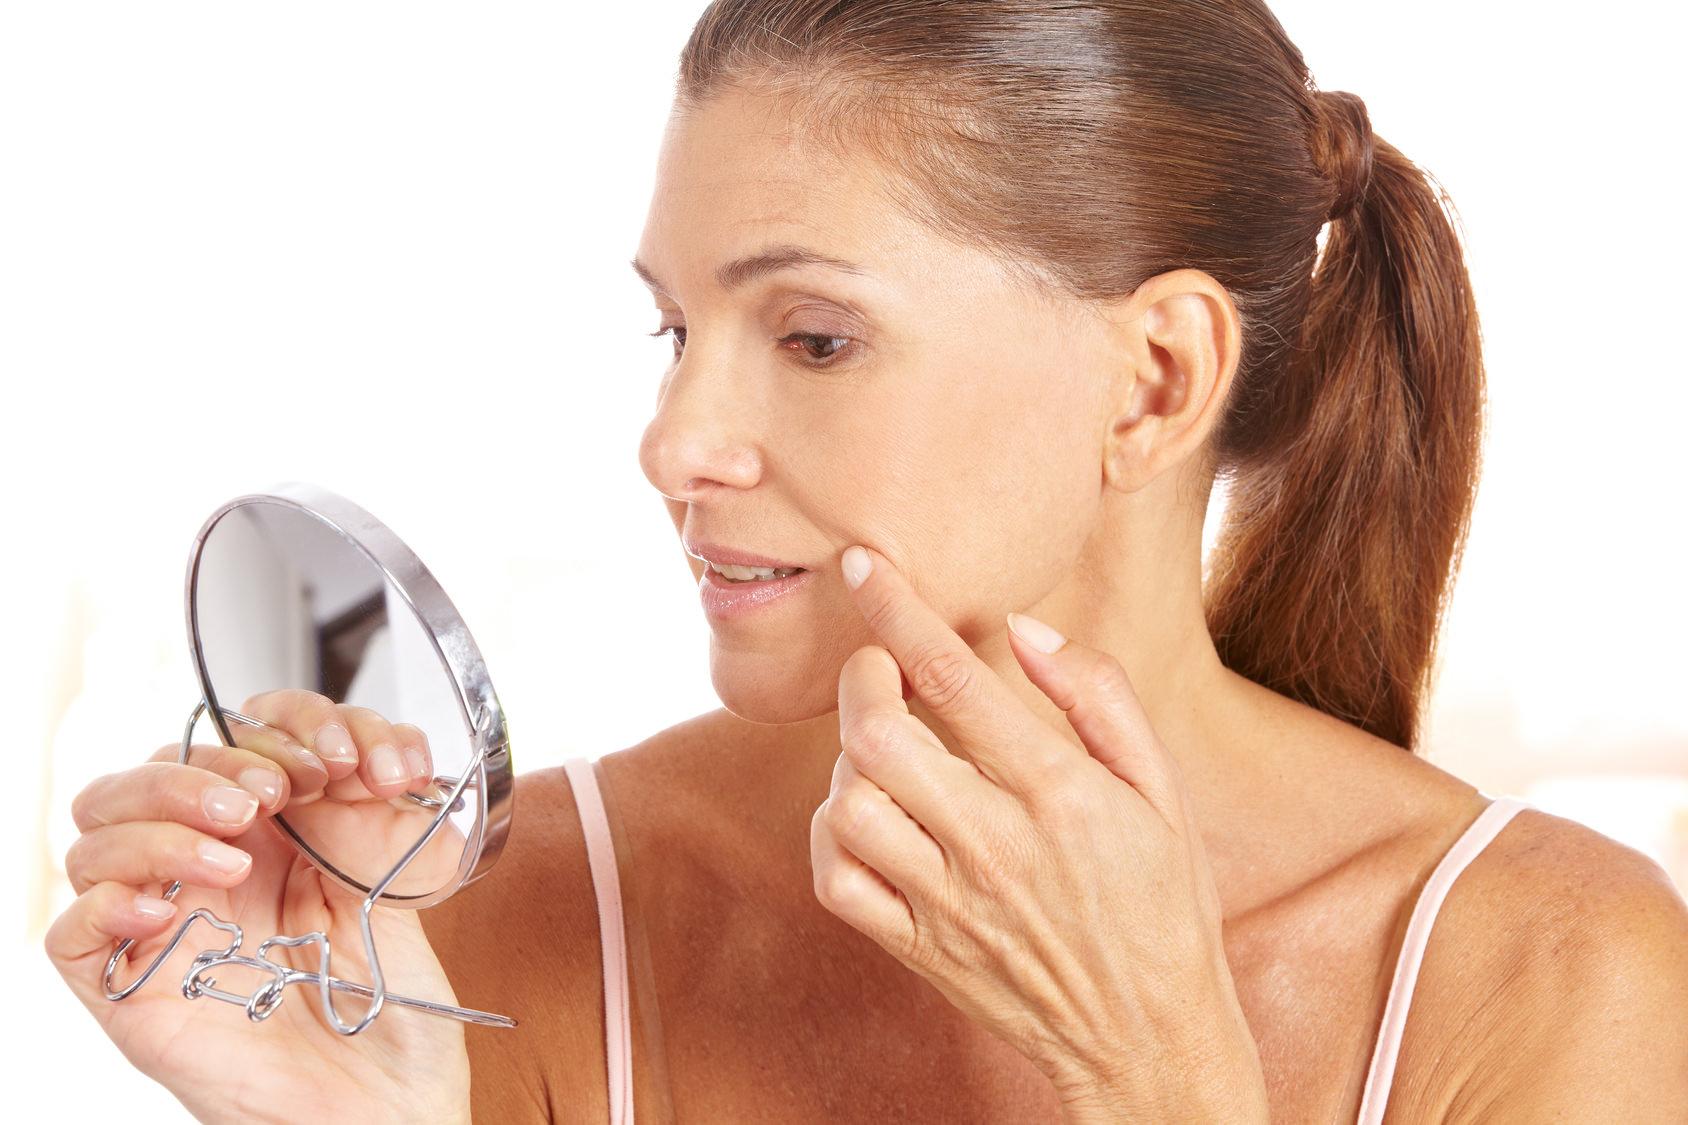 Clínica dermatológica madrid- lesiones vasculares